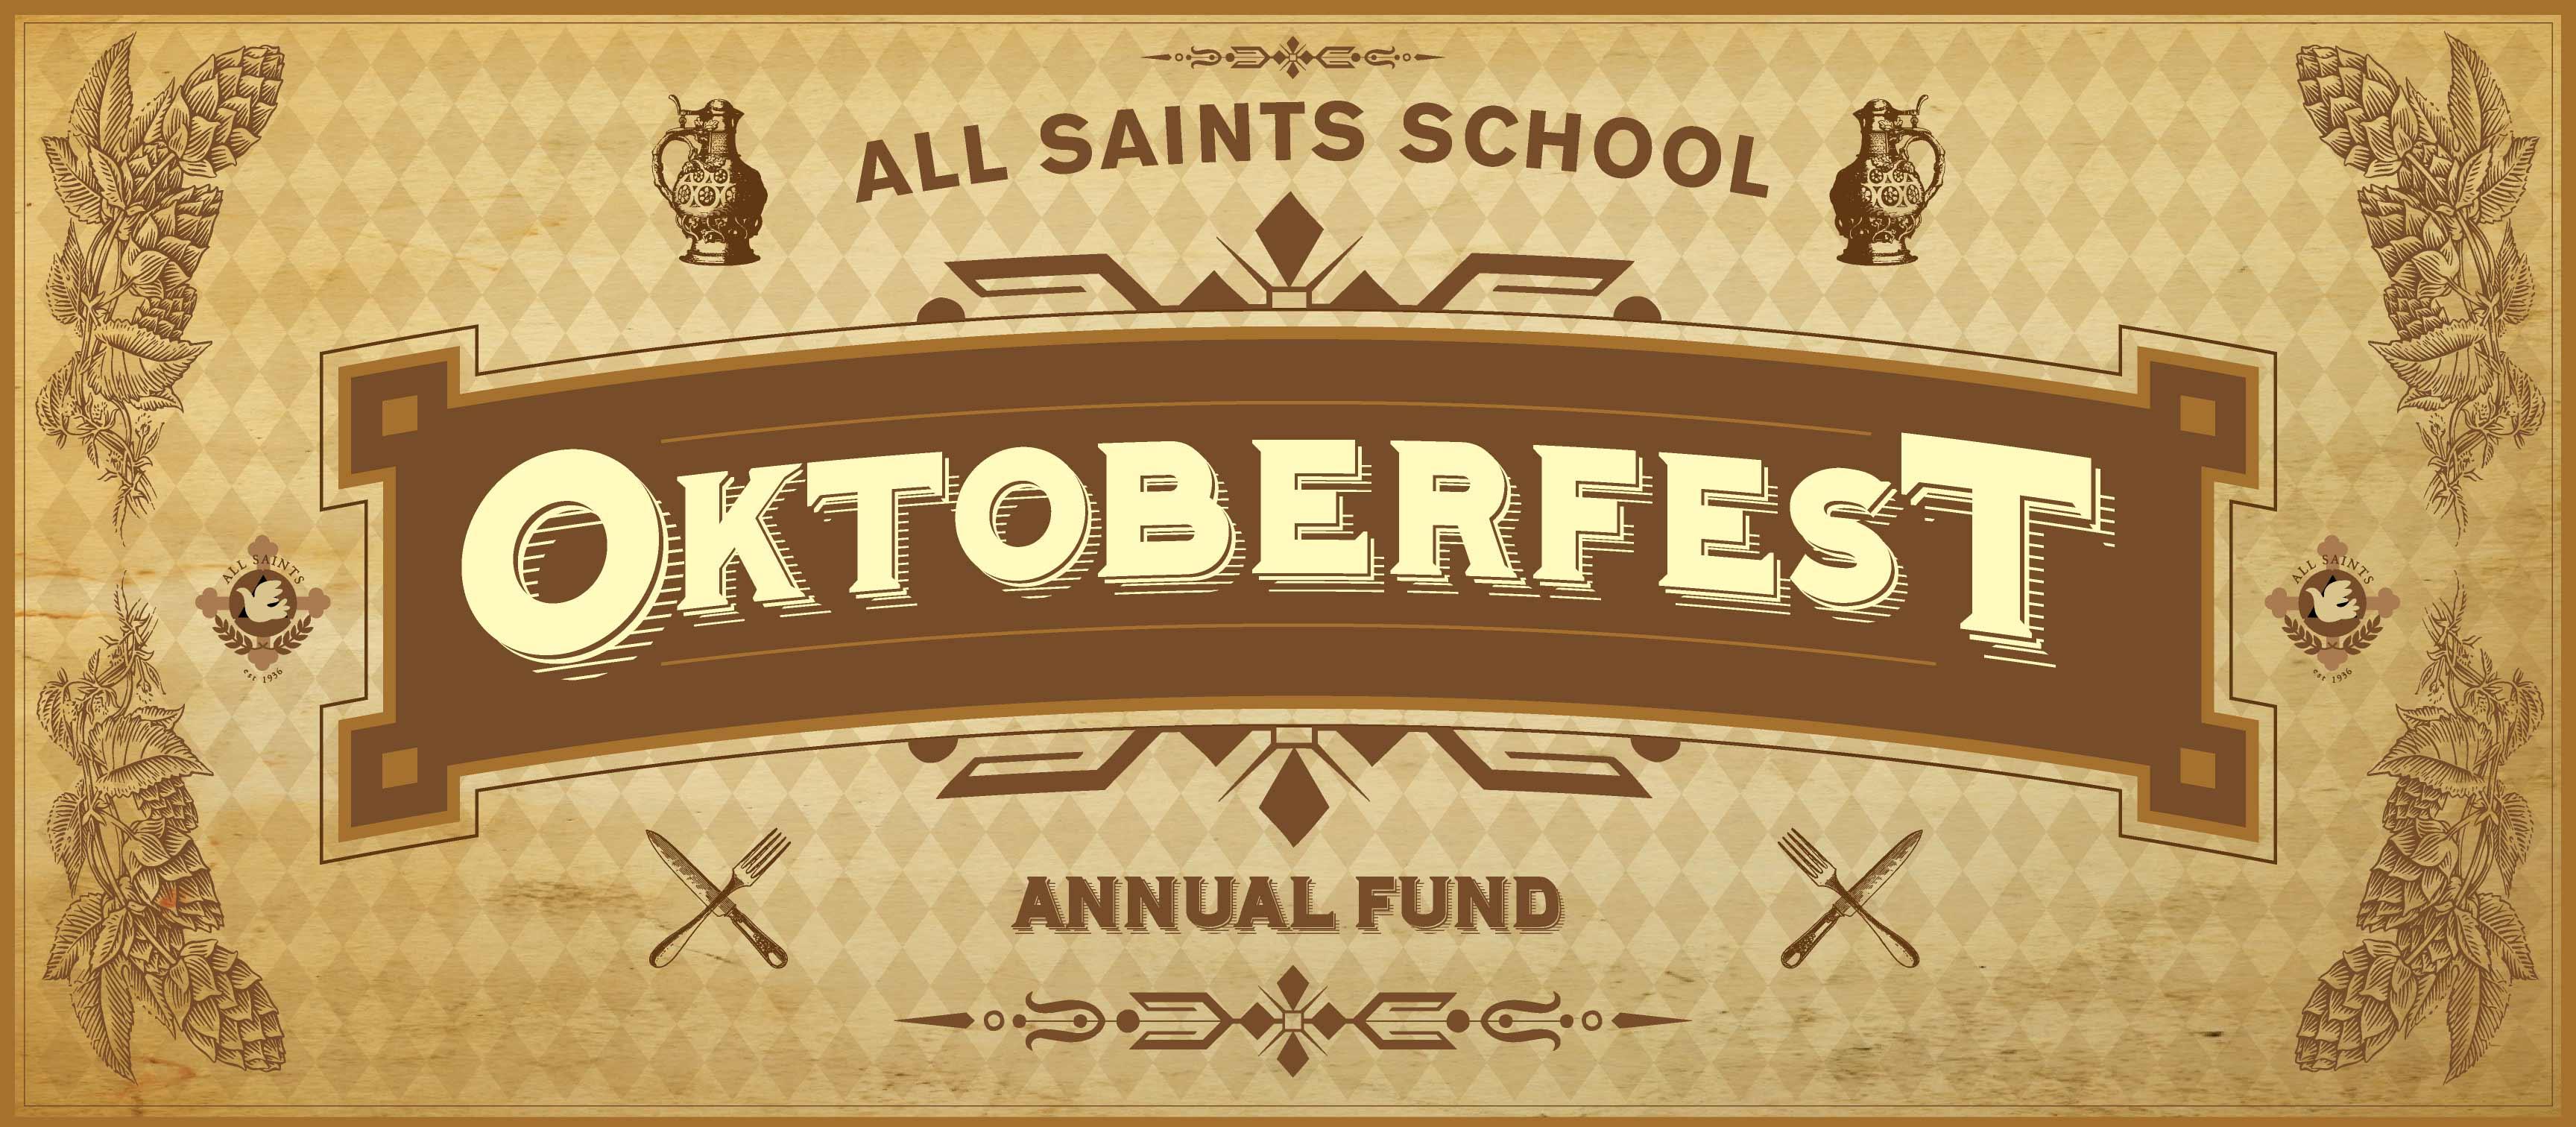 2016-s_oktoberfest_banner-_1_